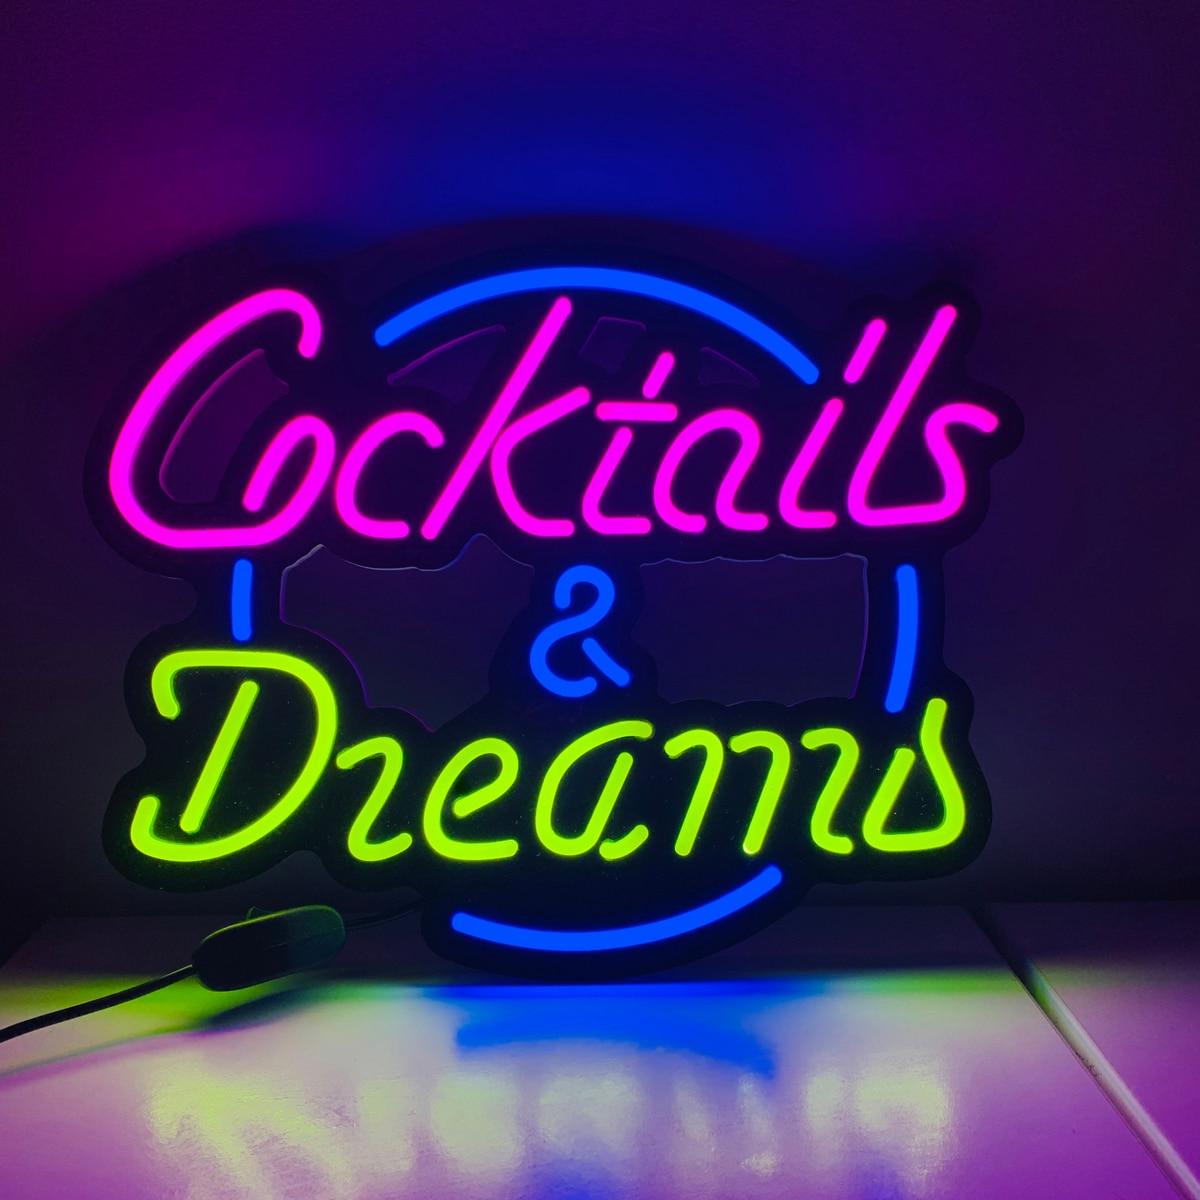 Custom led neon lights, handmade beer bar, store logo, bar, nightclub enlarge